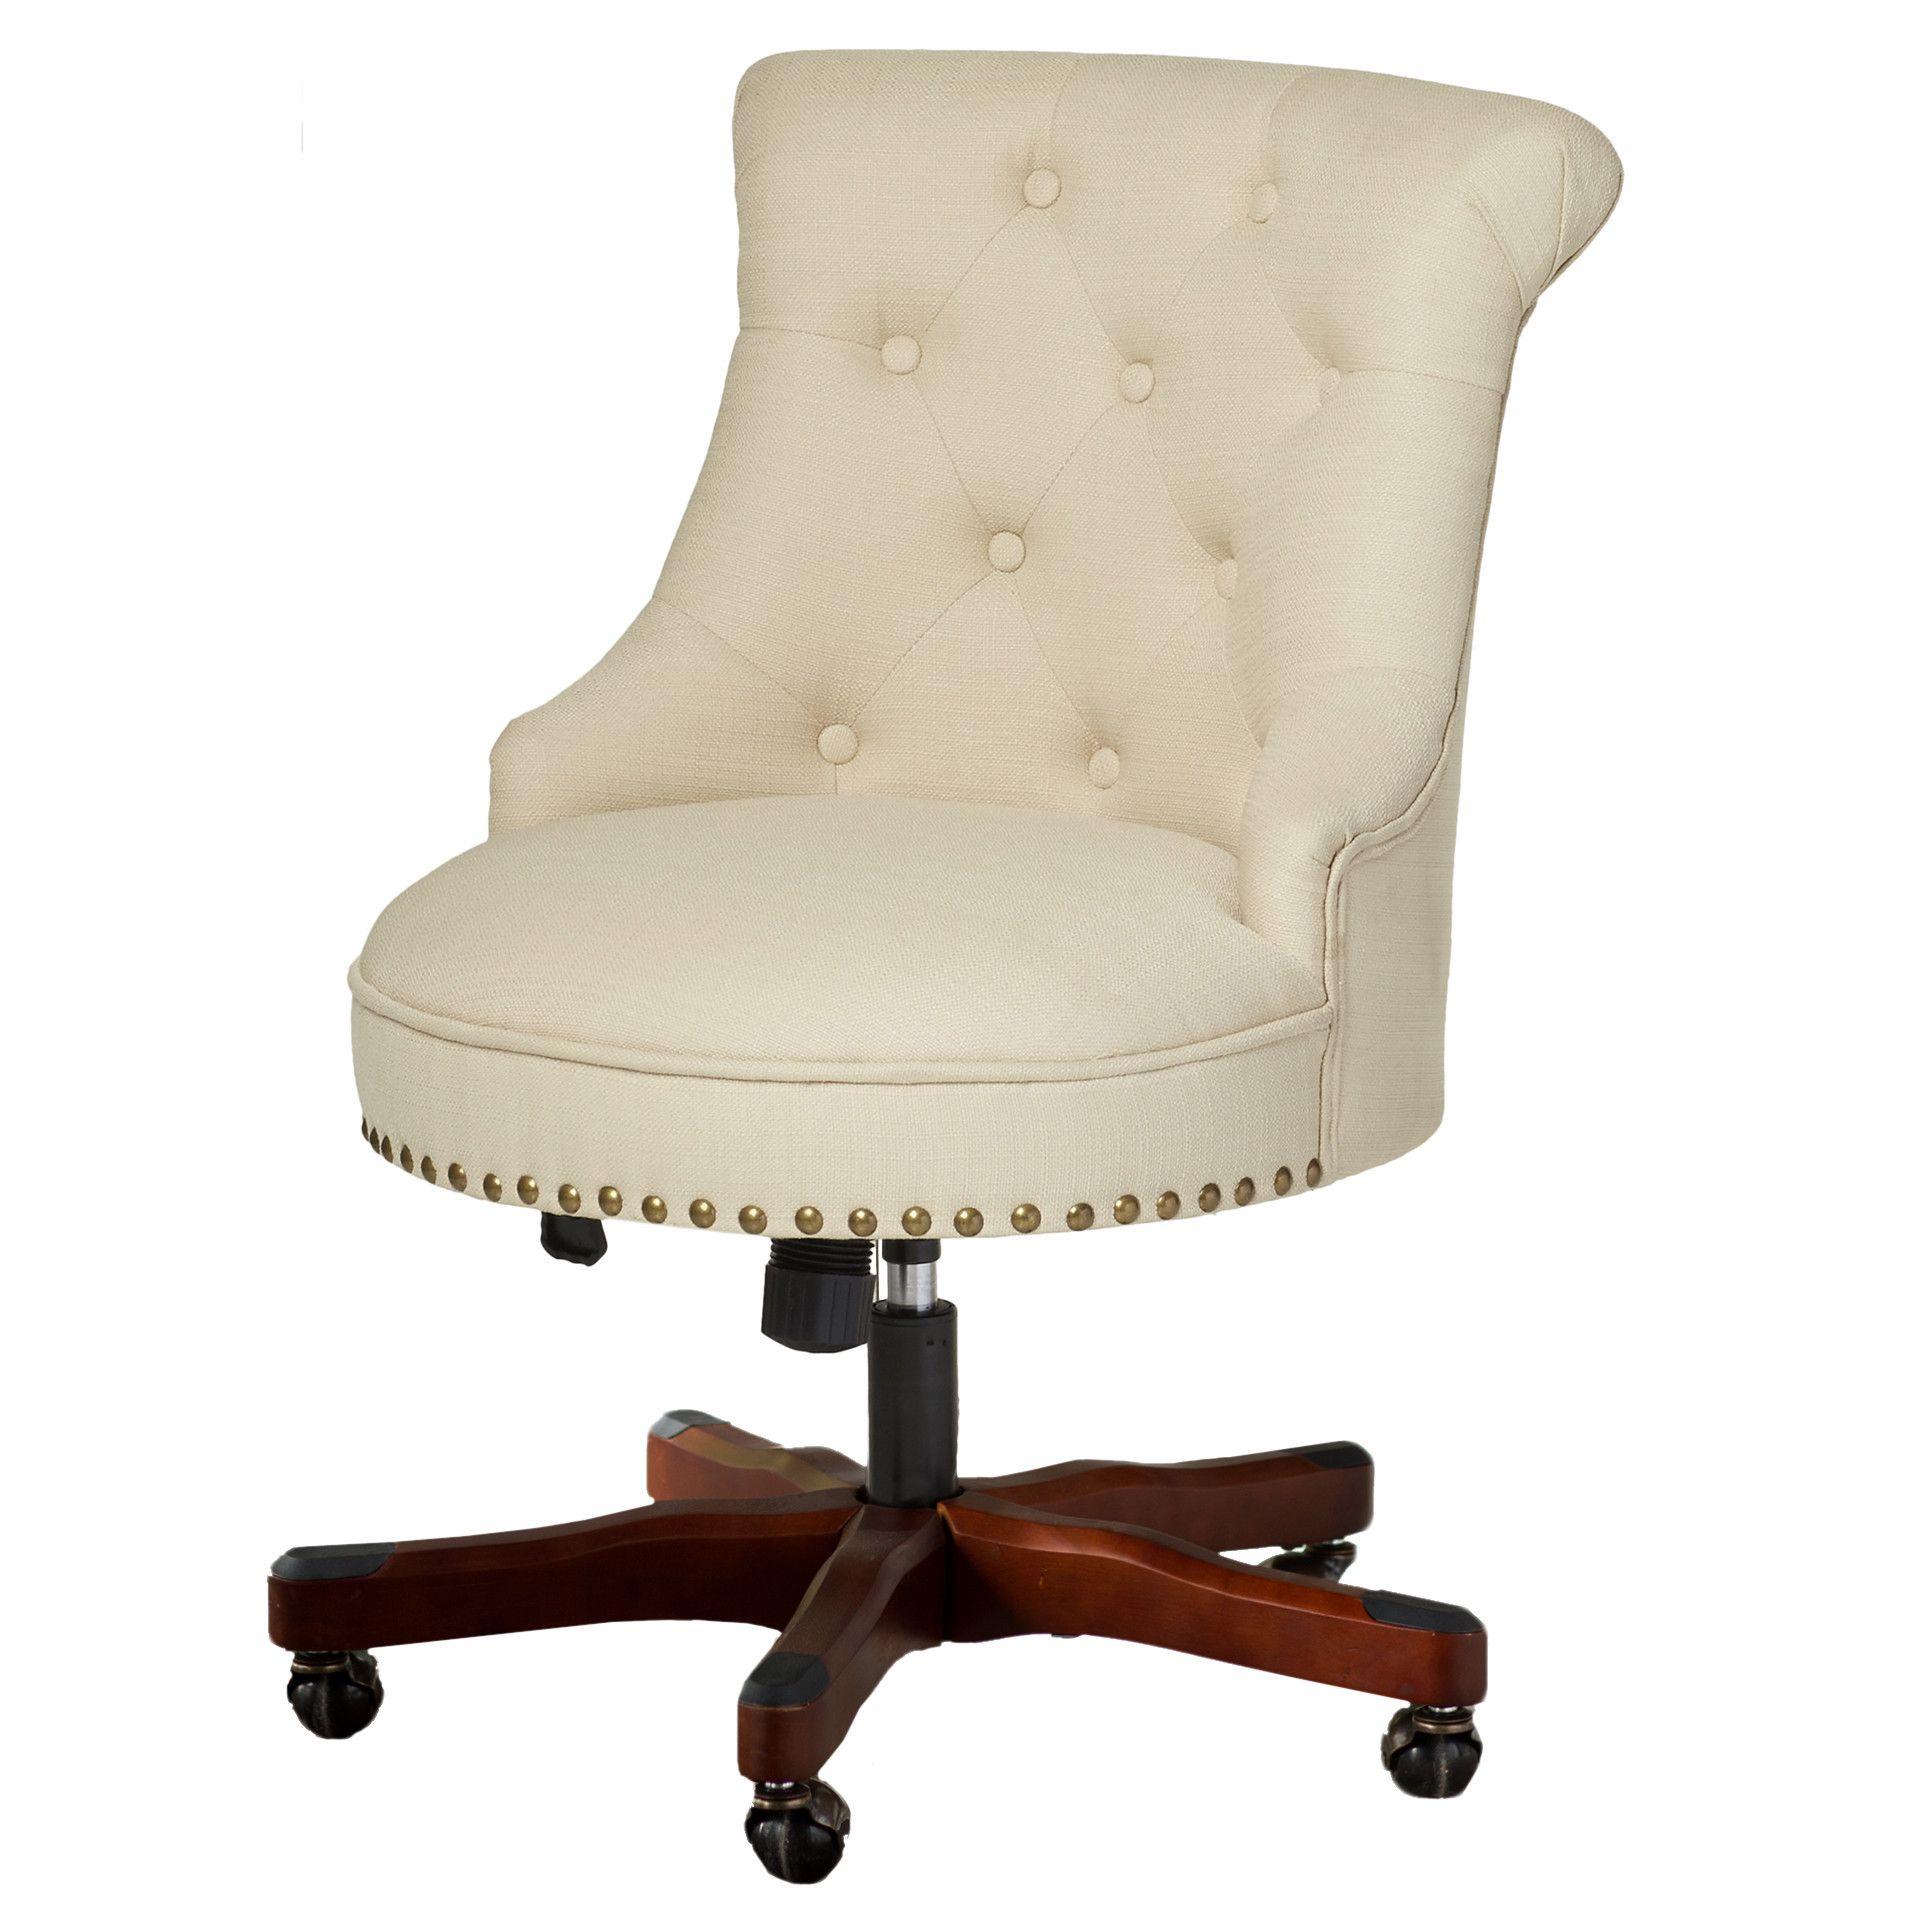 Eckard Desk Chair cream fice Chairs Pinterest